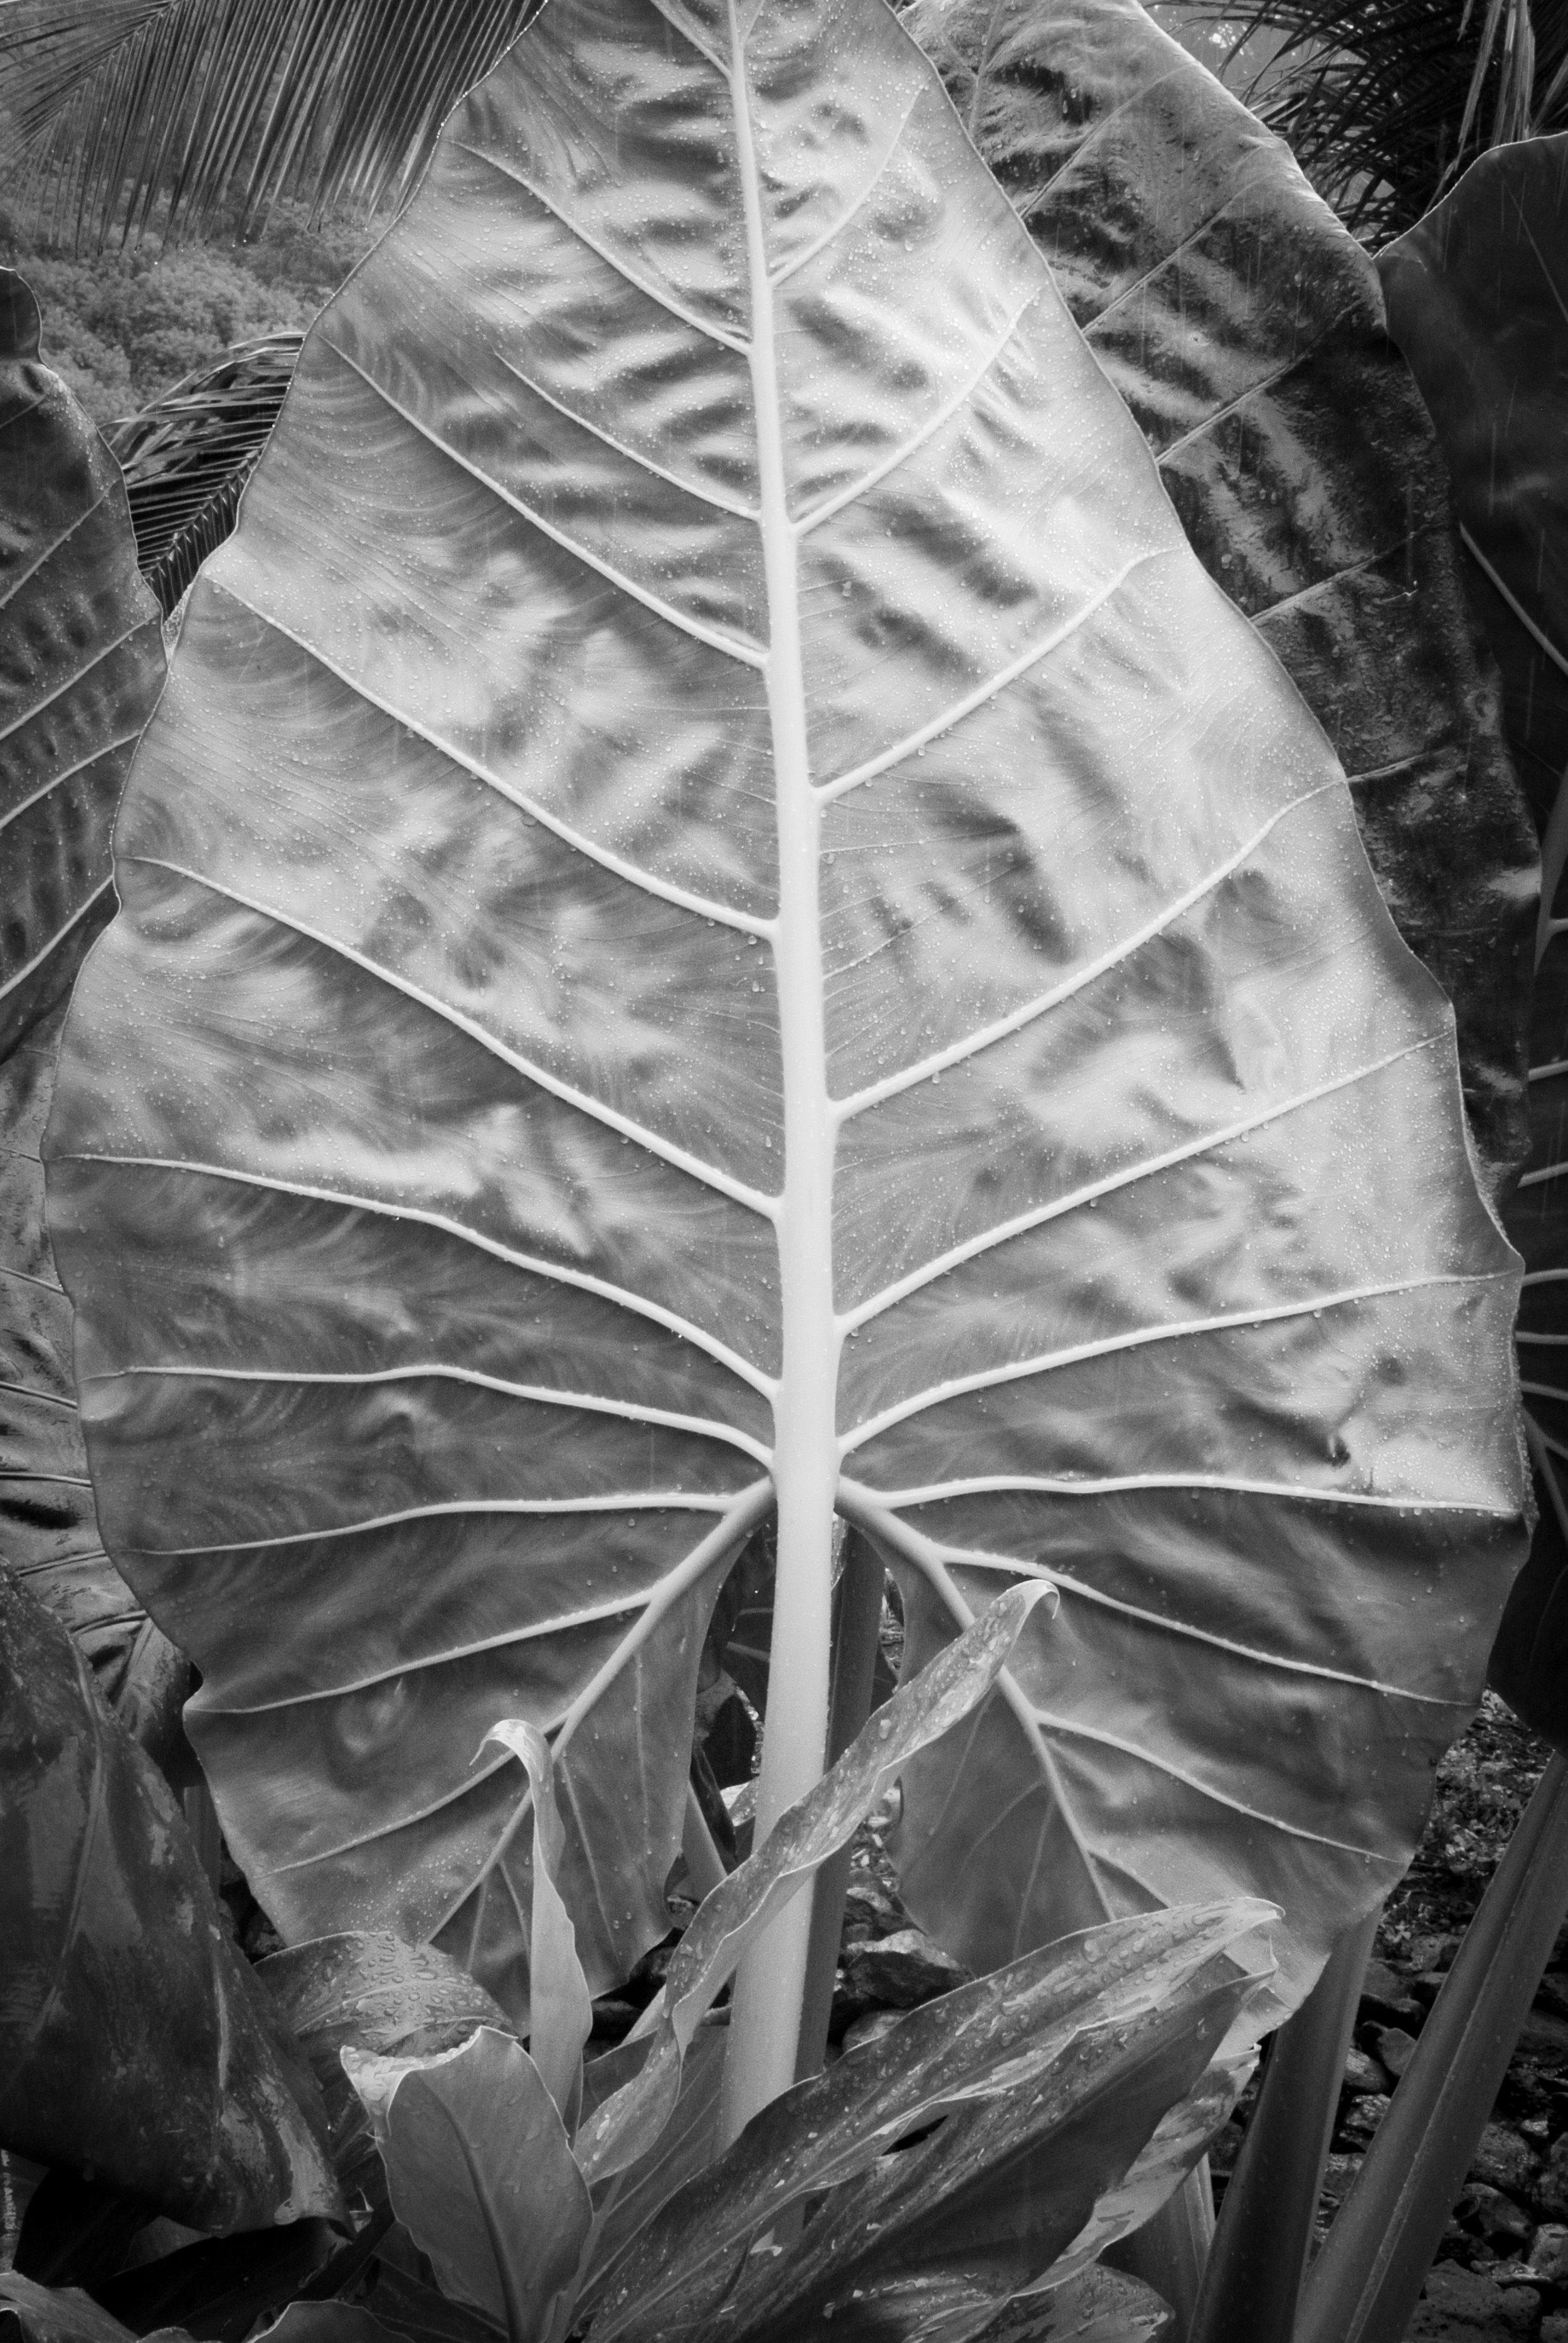 `Ape, McBryde Gardens, Kauai, Hawaii, 2018